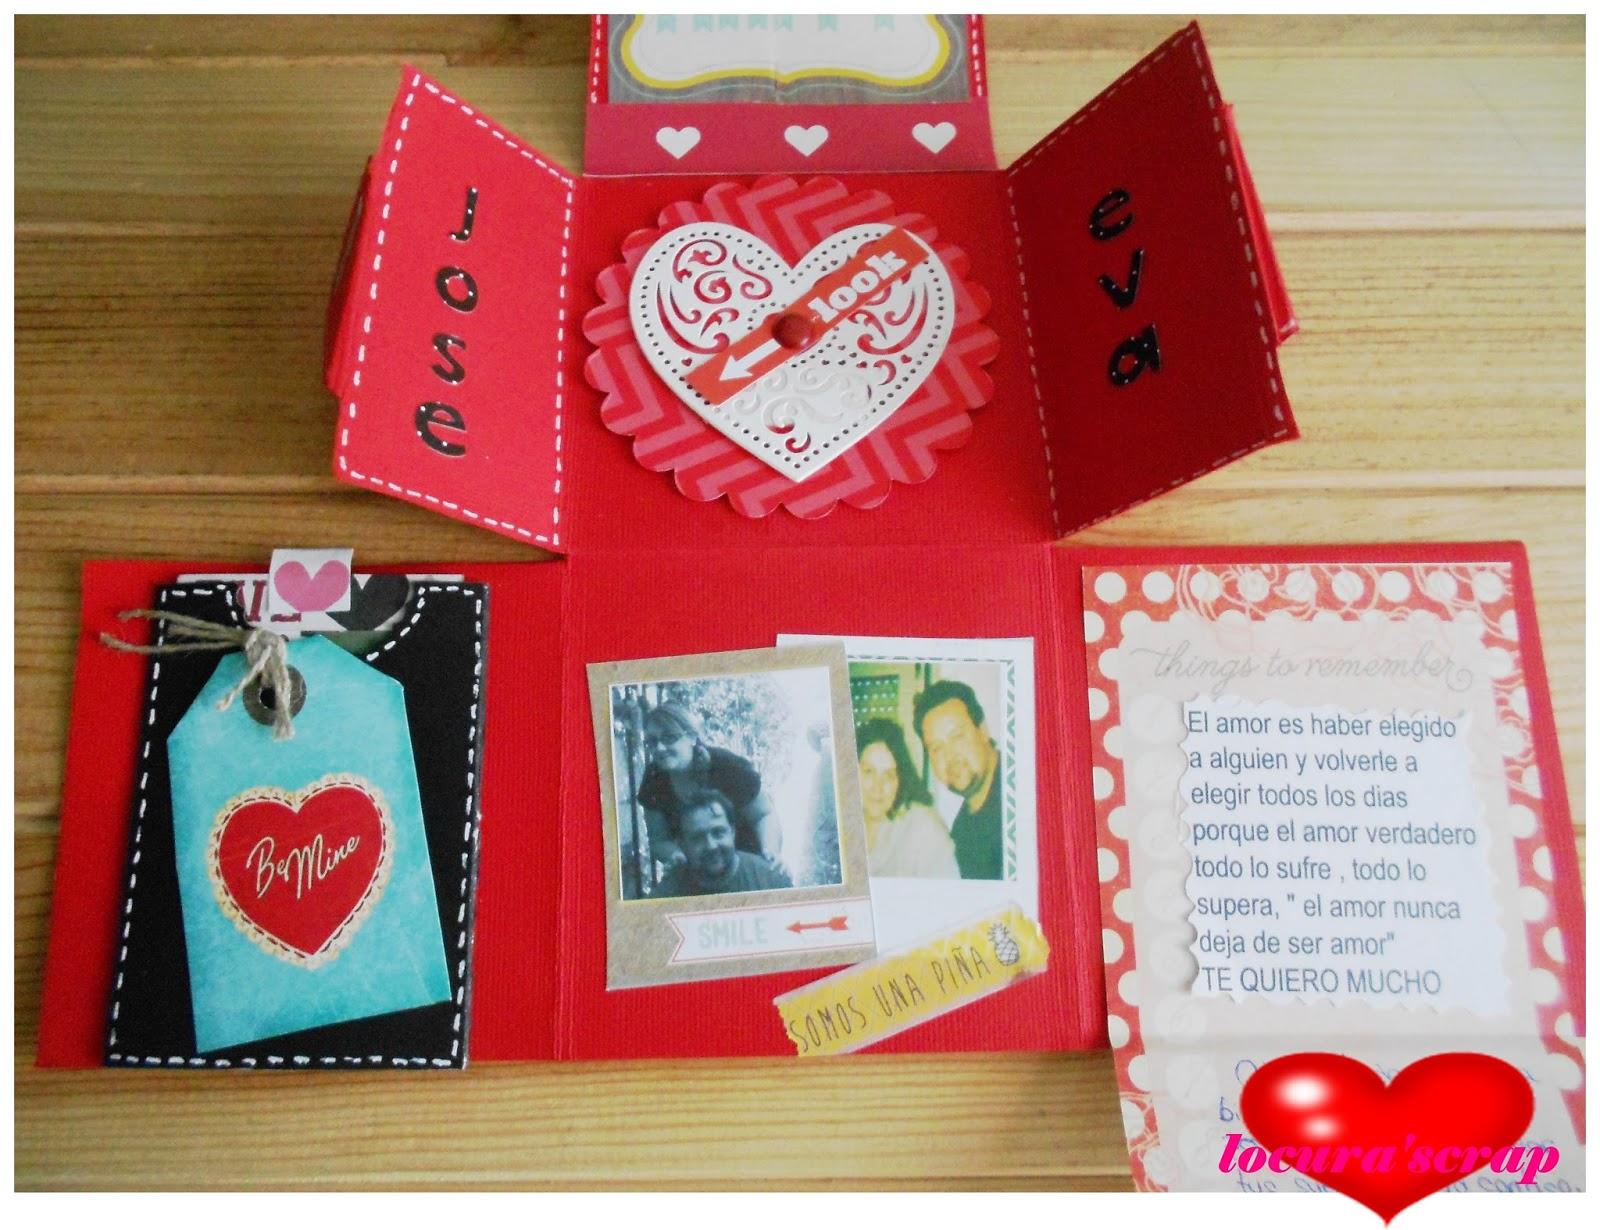 Ideas creativas para vender en san valentin - Ideas para regalar en san valentin ...